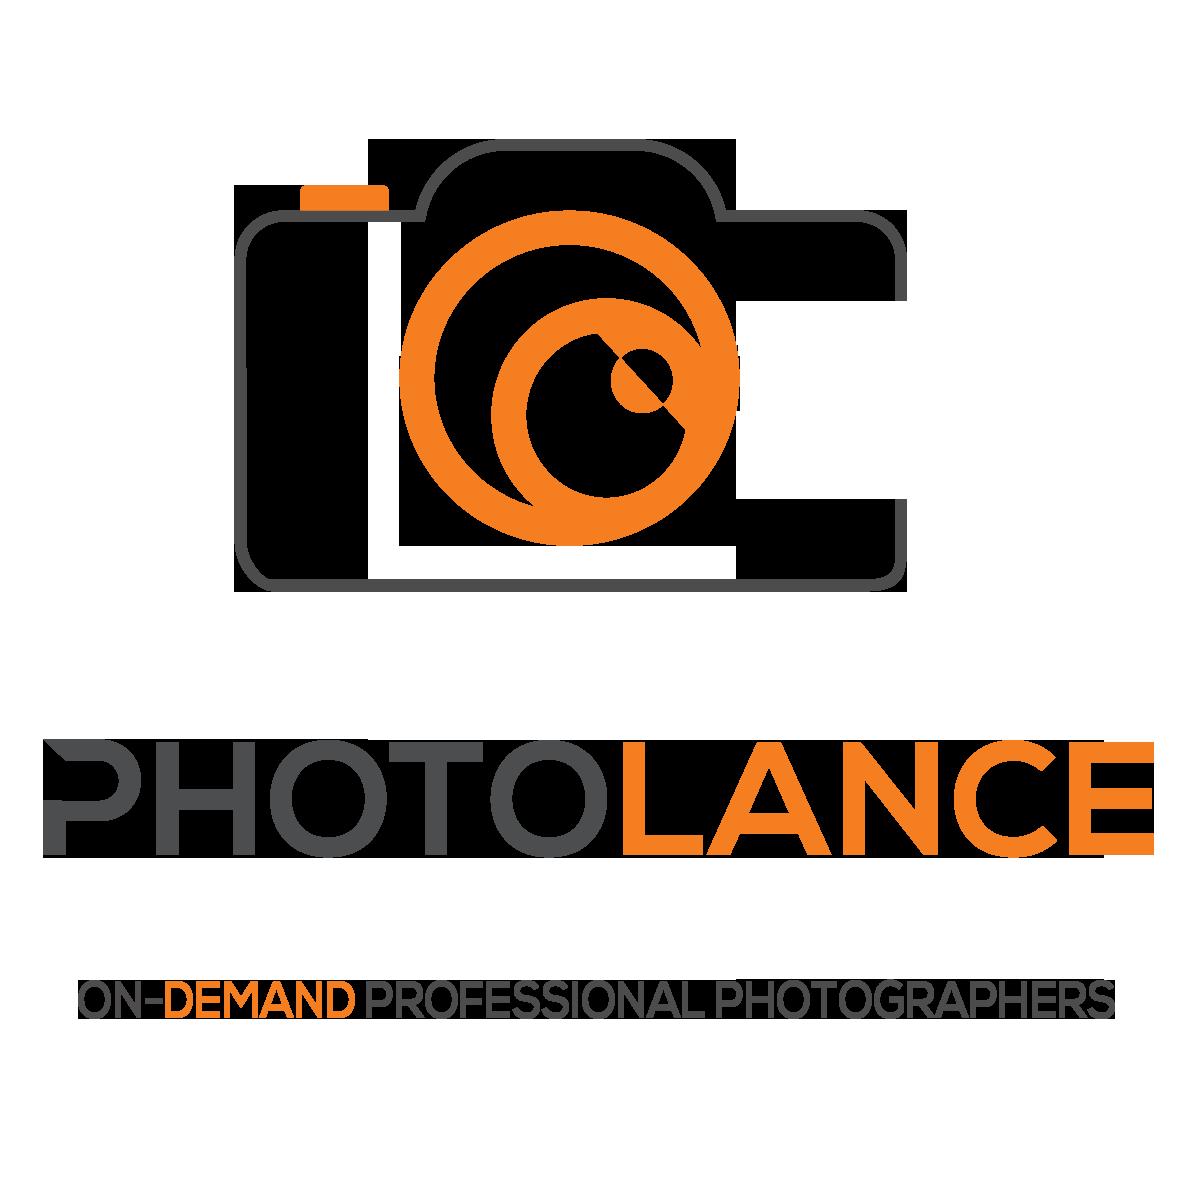 Photolance